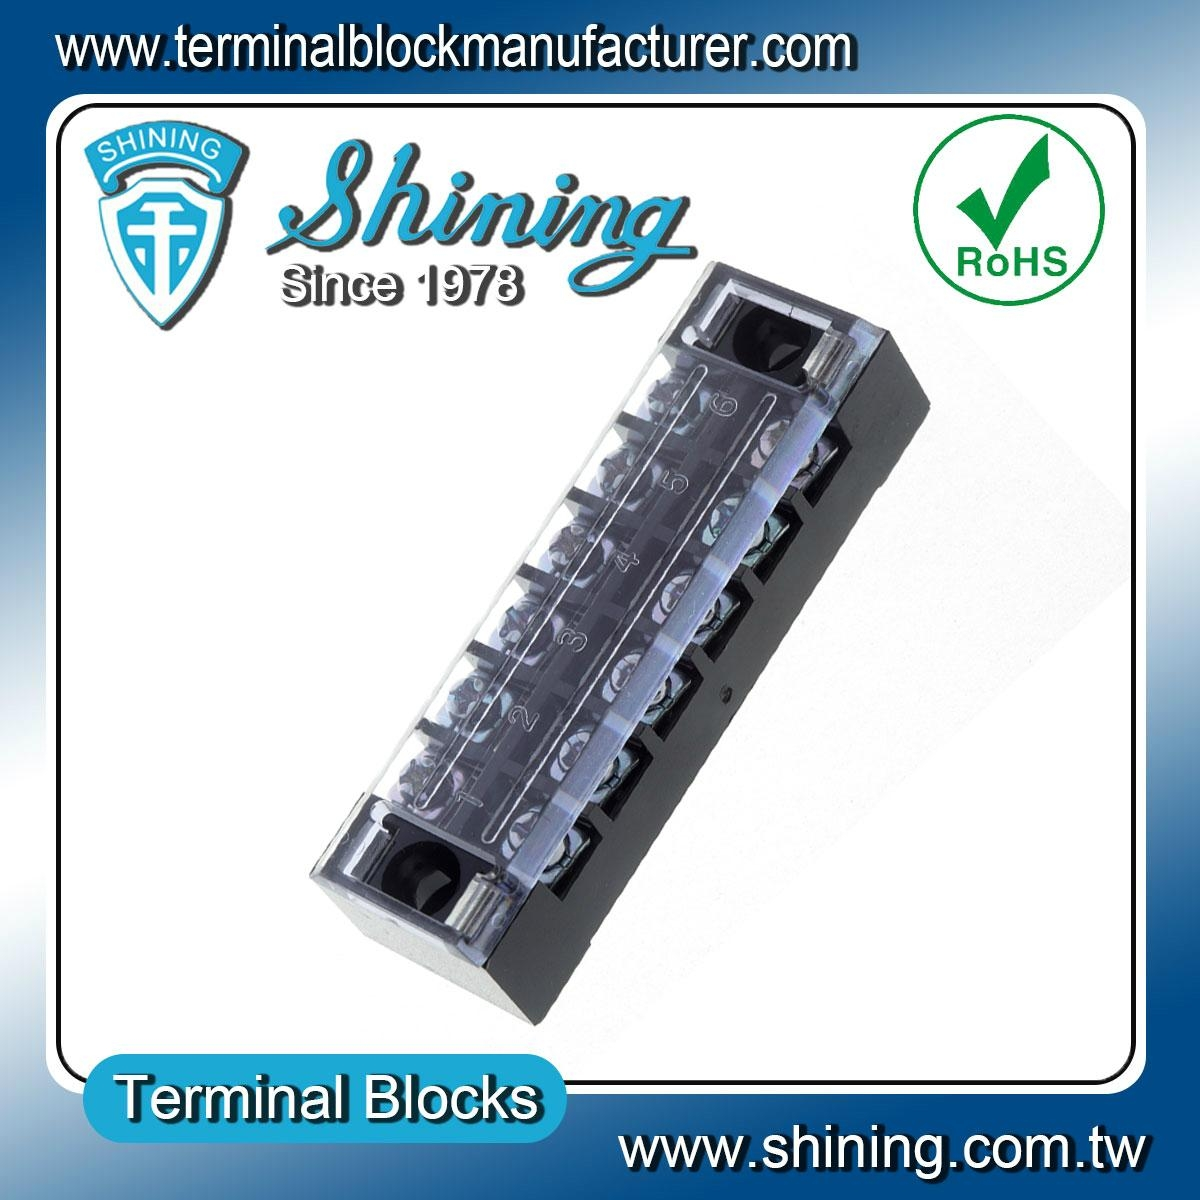 TB-1506 固定式端子台 Fixed Terminal Block 3